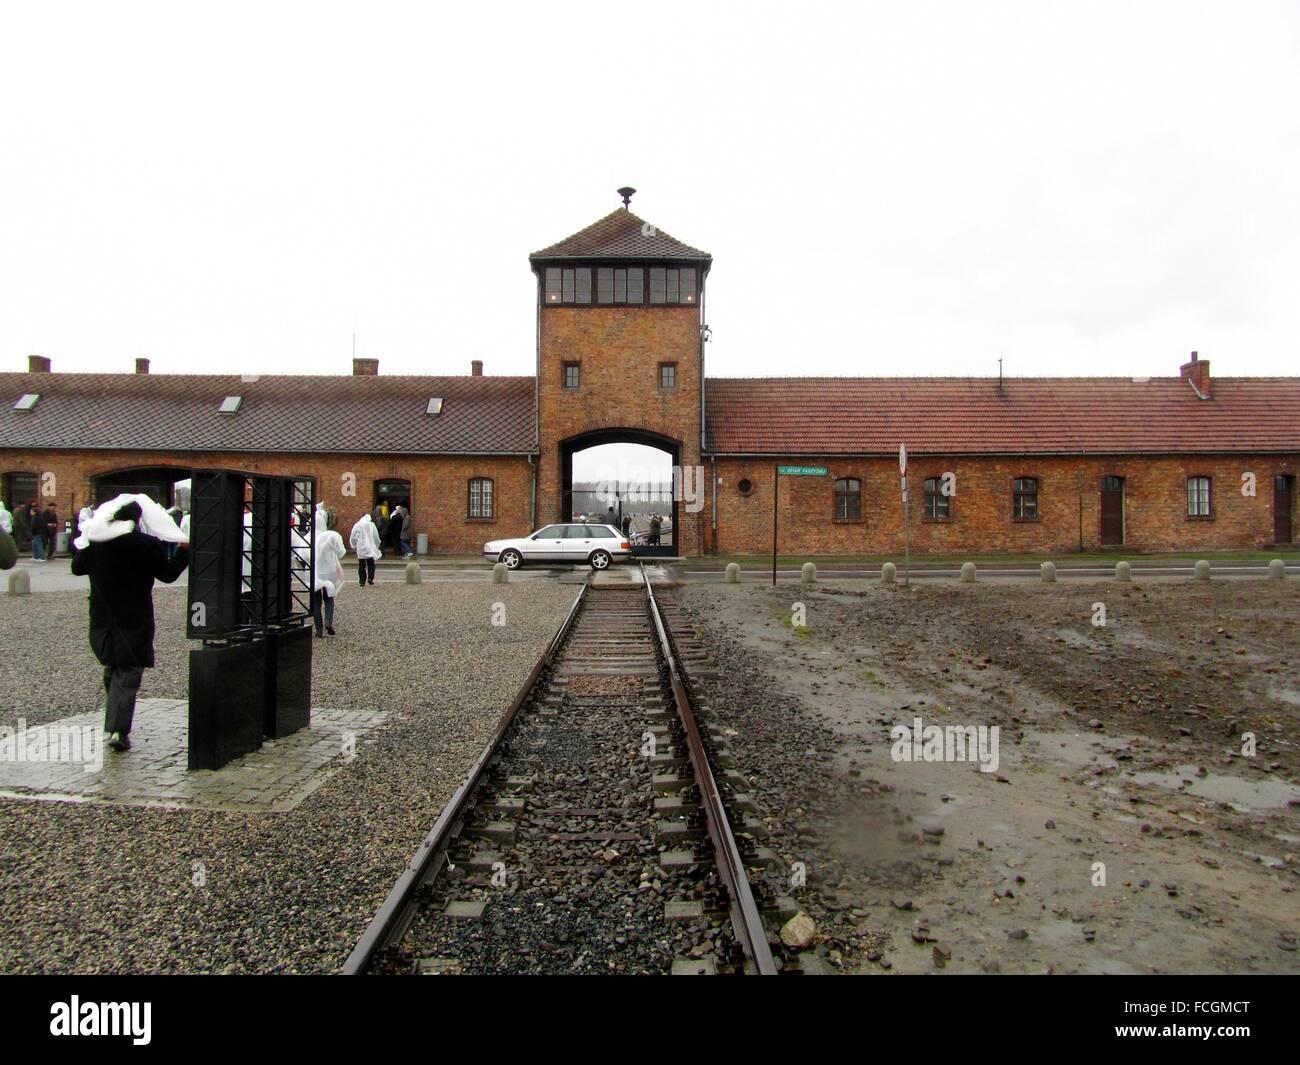 Auschwitz II - Birkenau Extermination Camp main entrance. Oswiecim, Poland, Europe. - Stock Image